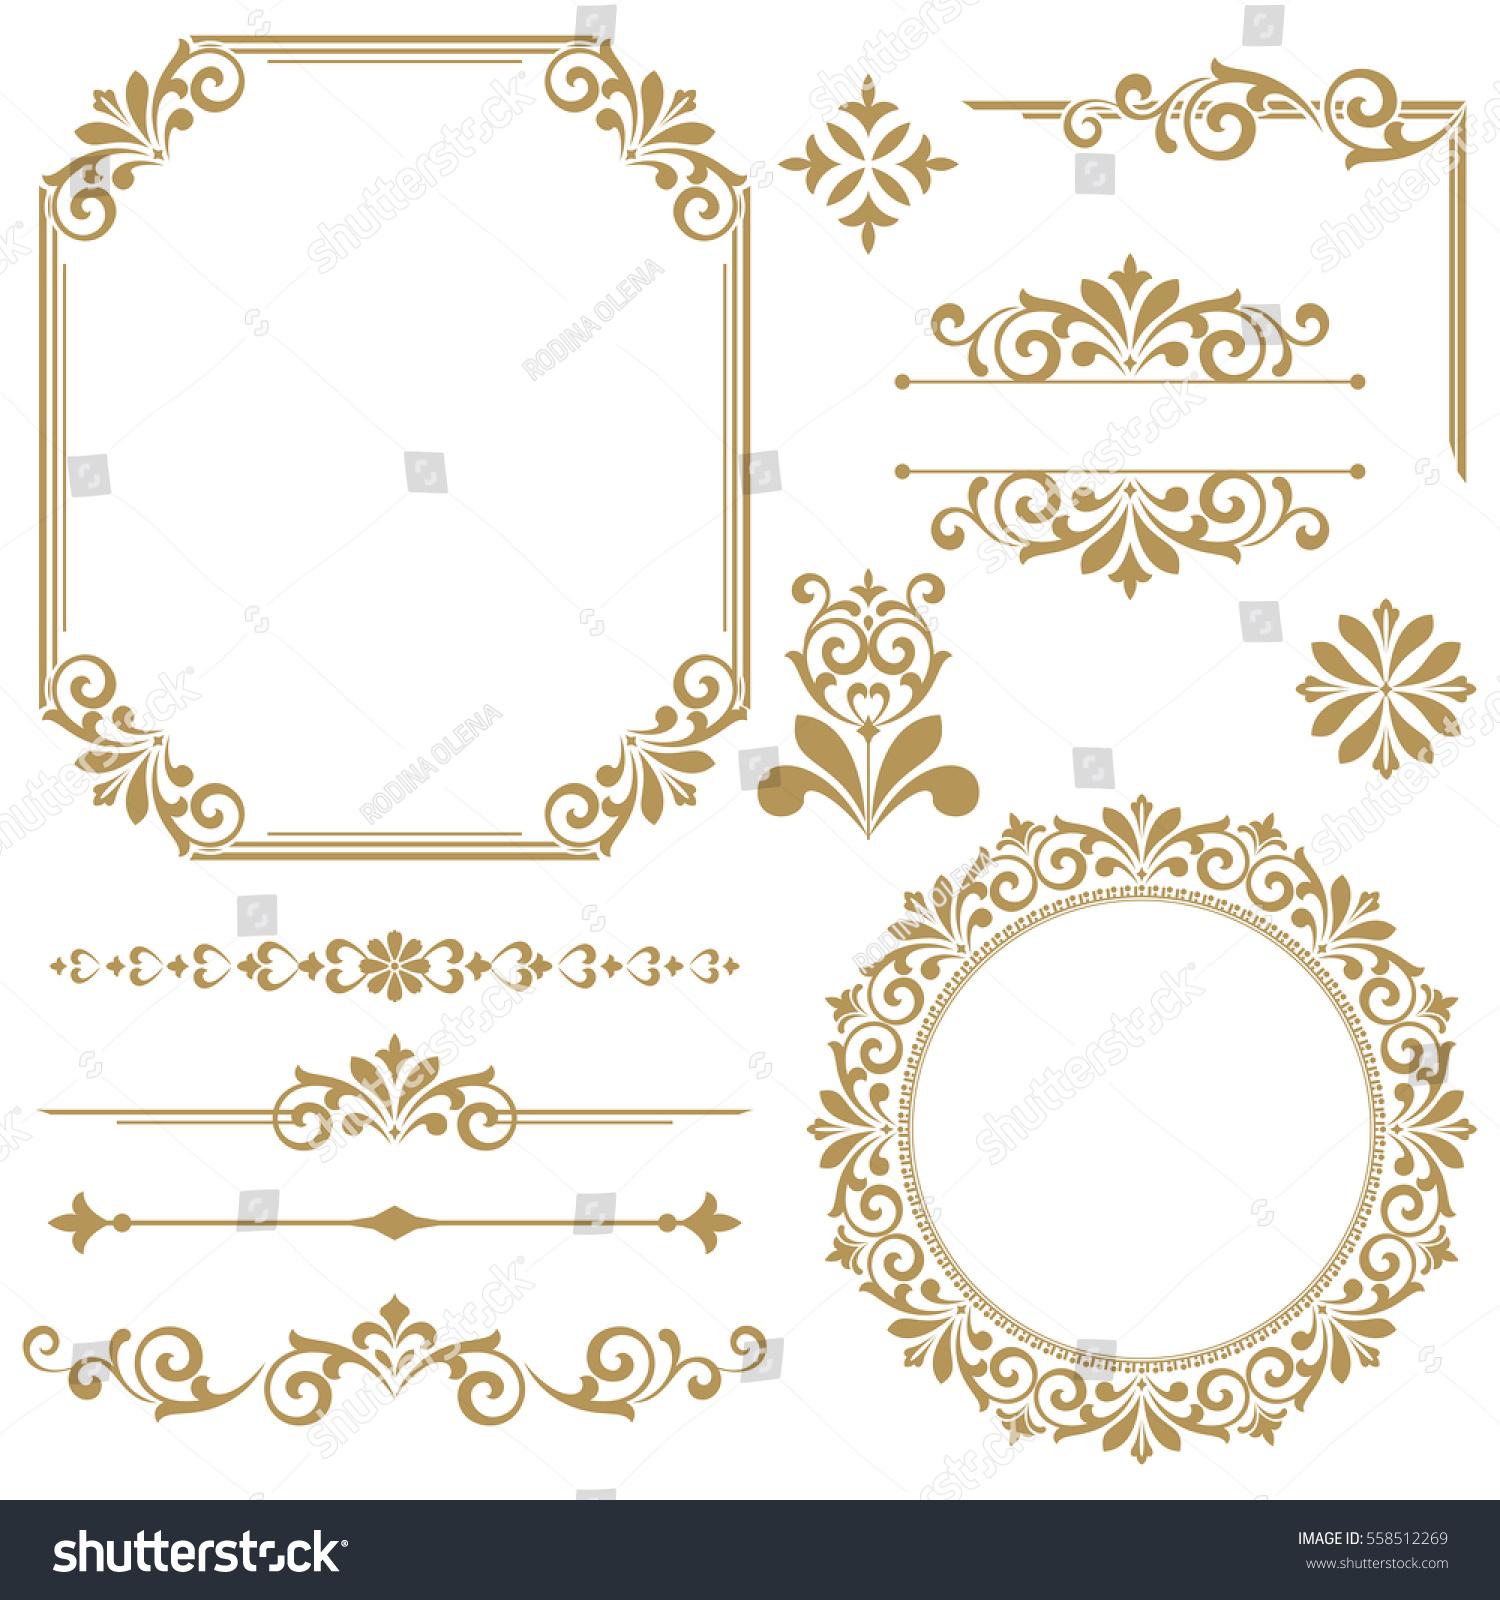 Vintage vector Set. Floral elements for design of monograms, invitations, frames, menus, labels and websites. Graphic elements for design of catalogs and brochures of cafes, boutiques #558512269